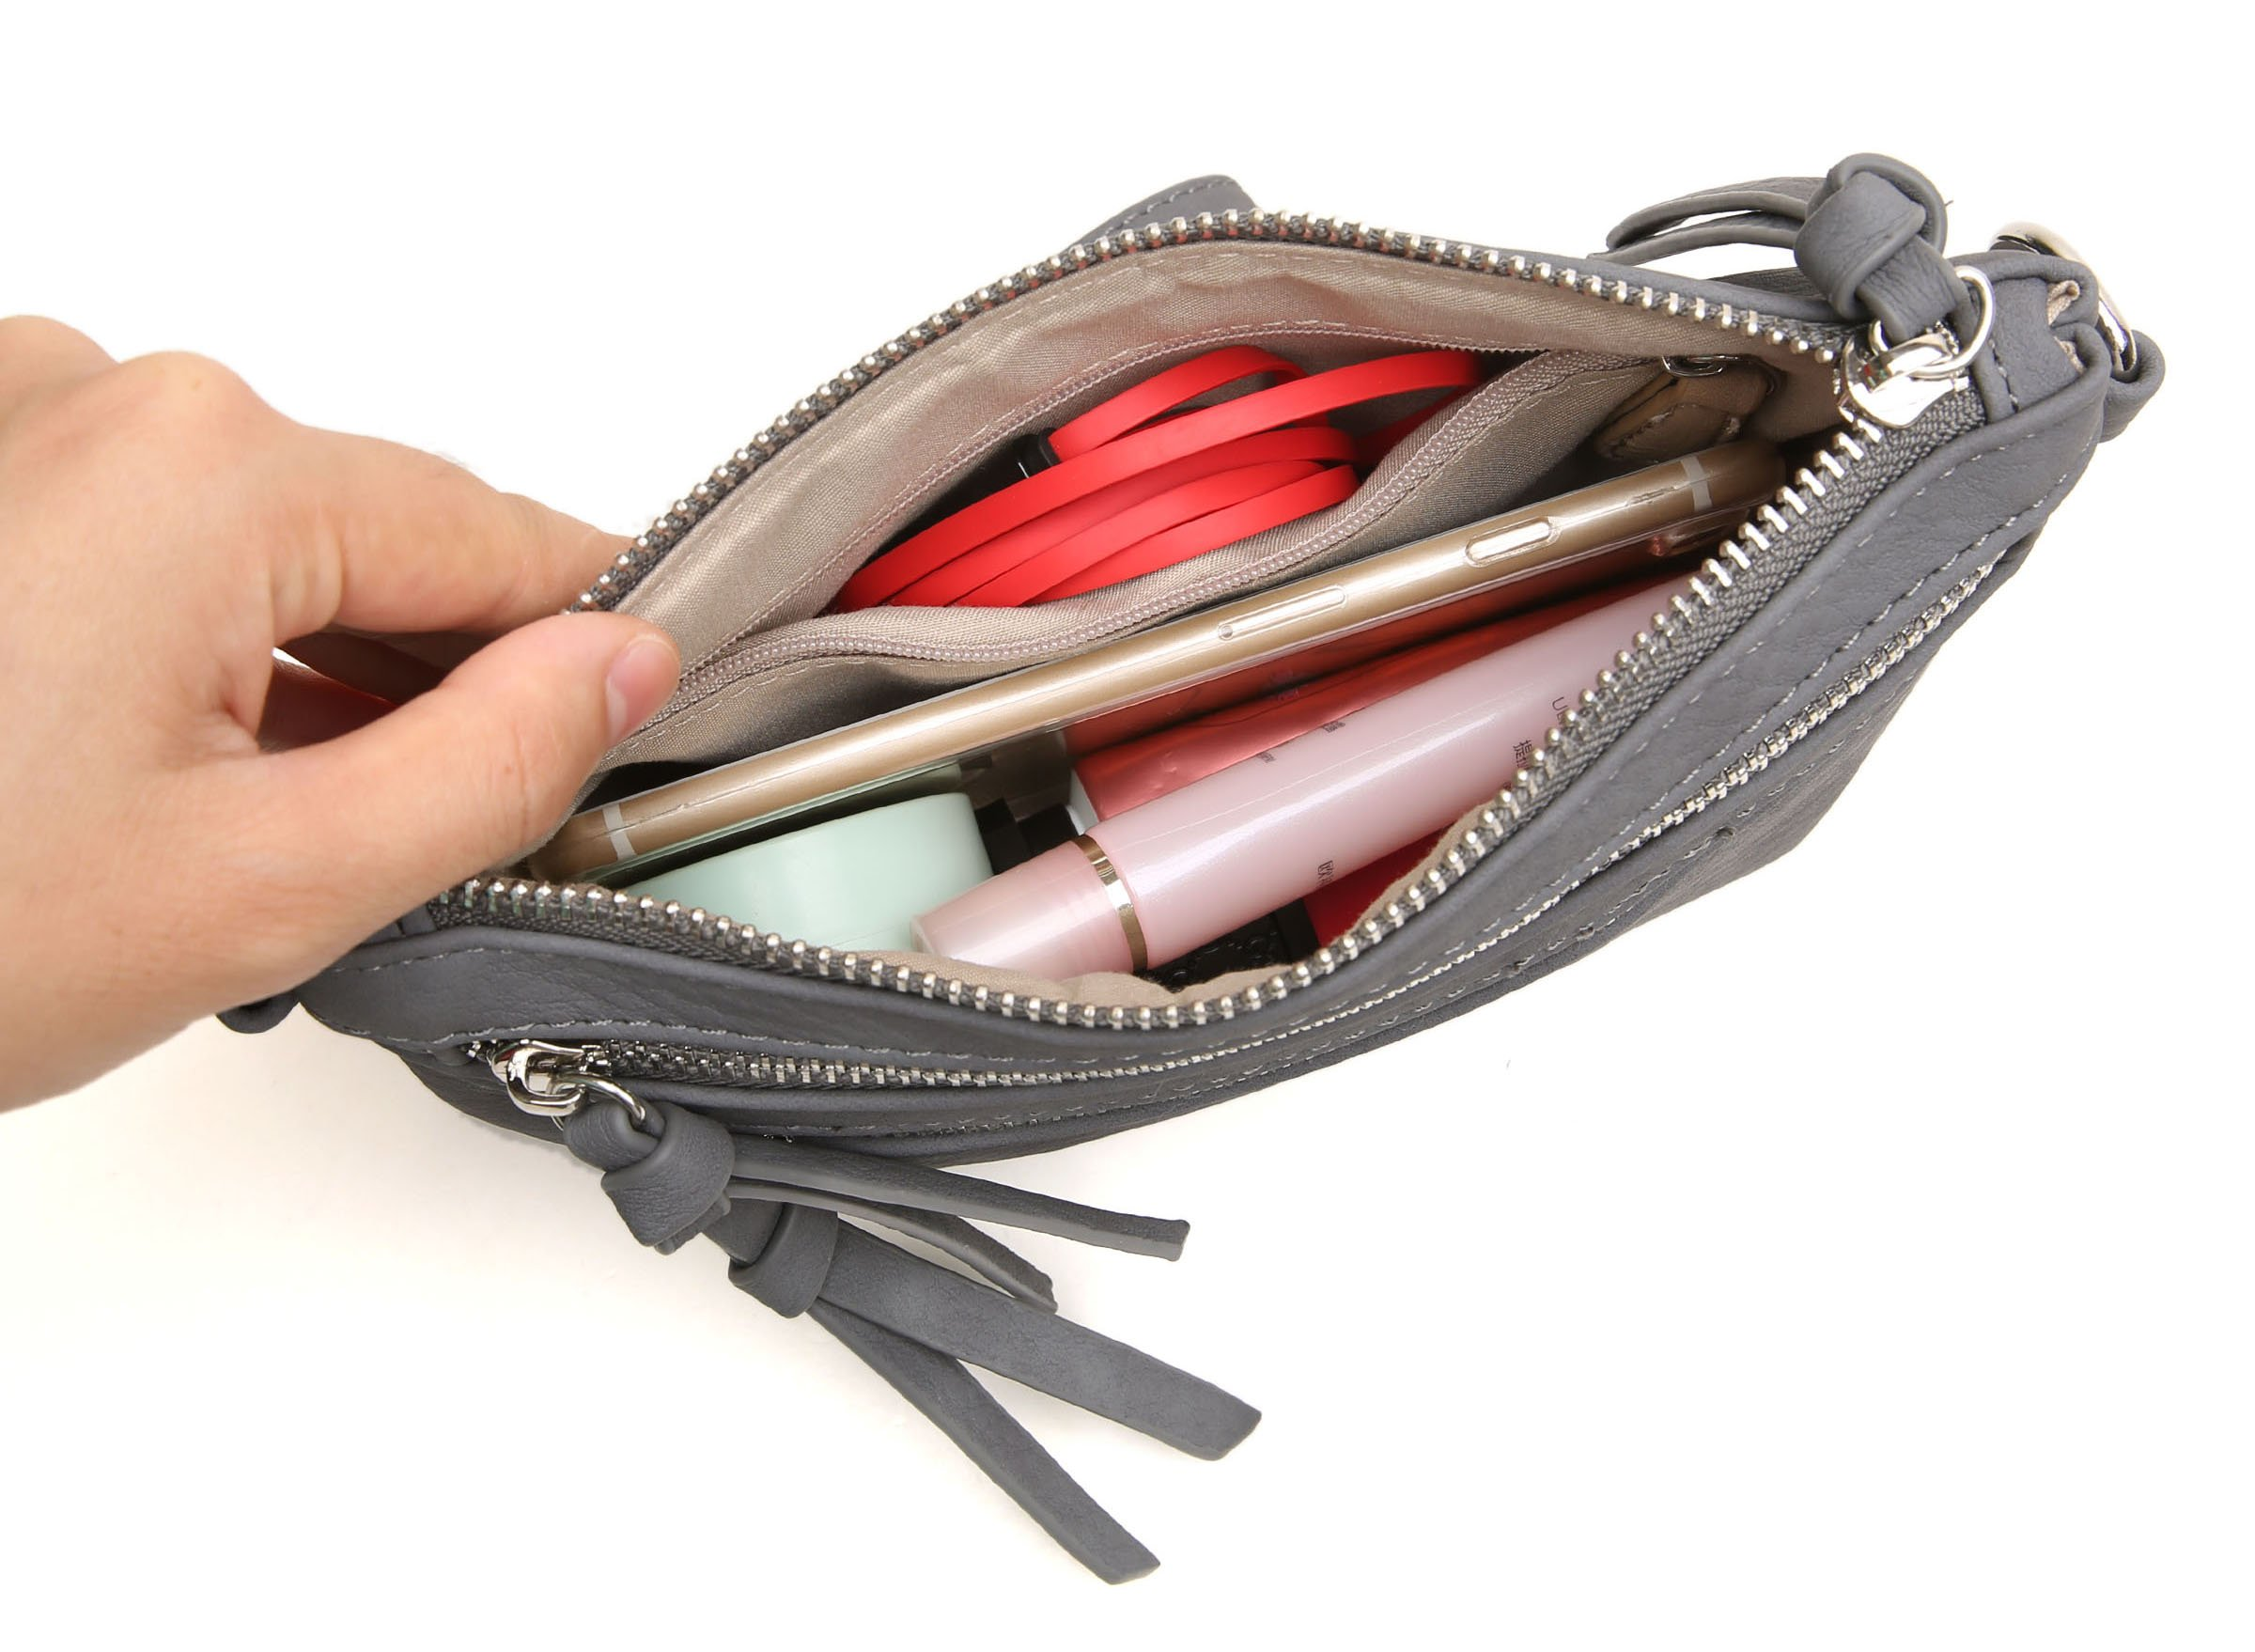 Aitbags Multi-Zipper Pocket Crossbody Handbag Lightweight Purse Functional Clutch with Wristlet by Aitbags (Image #6)